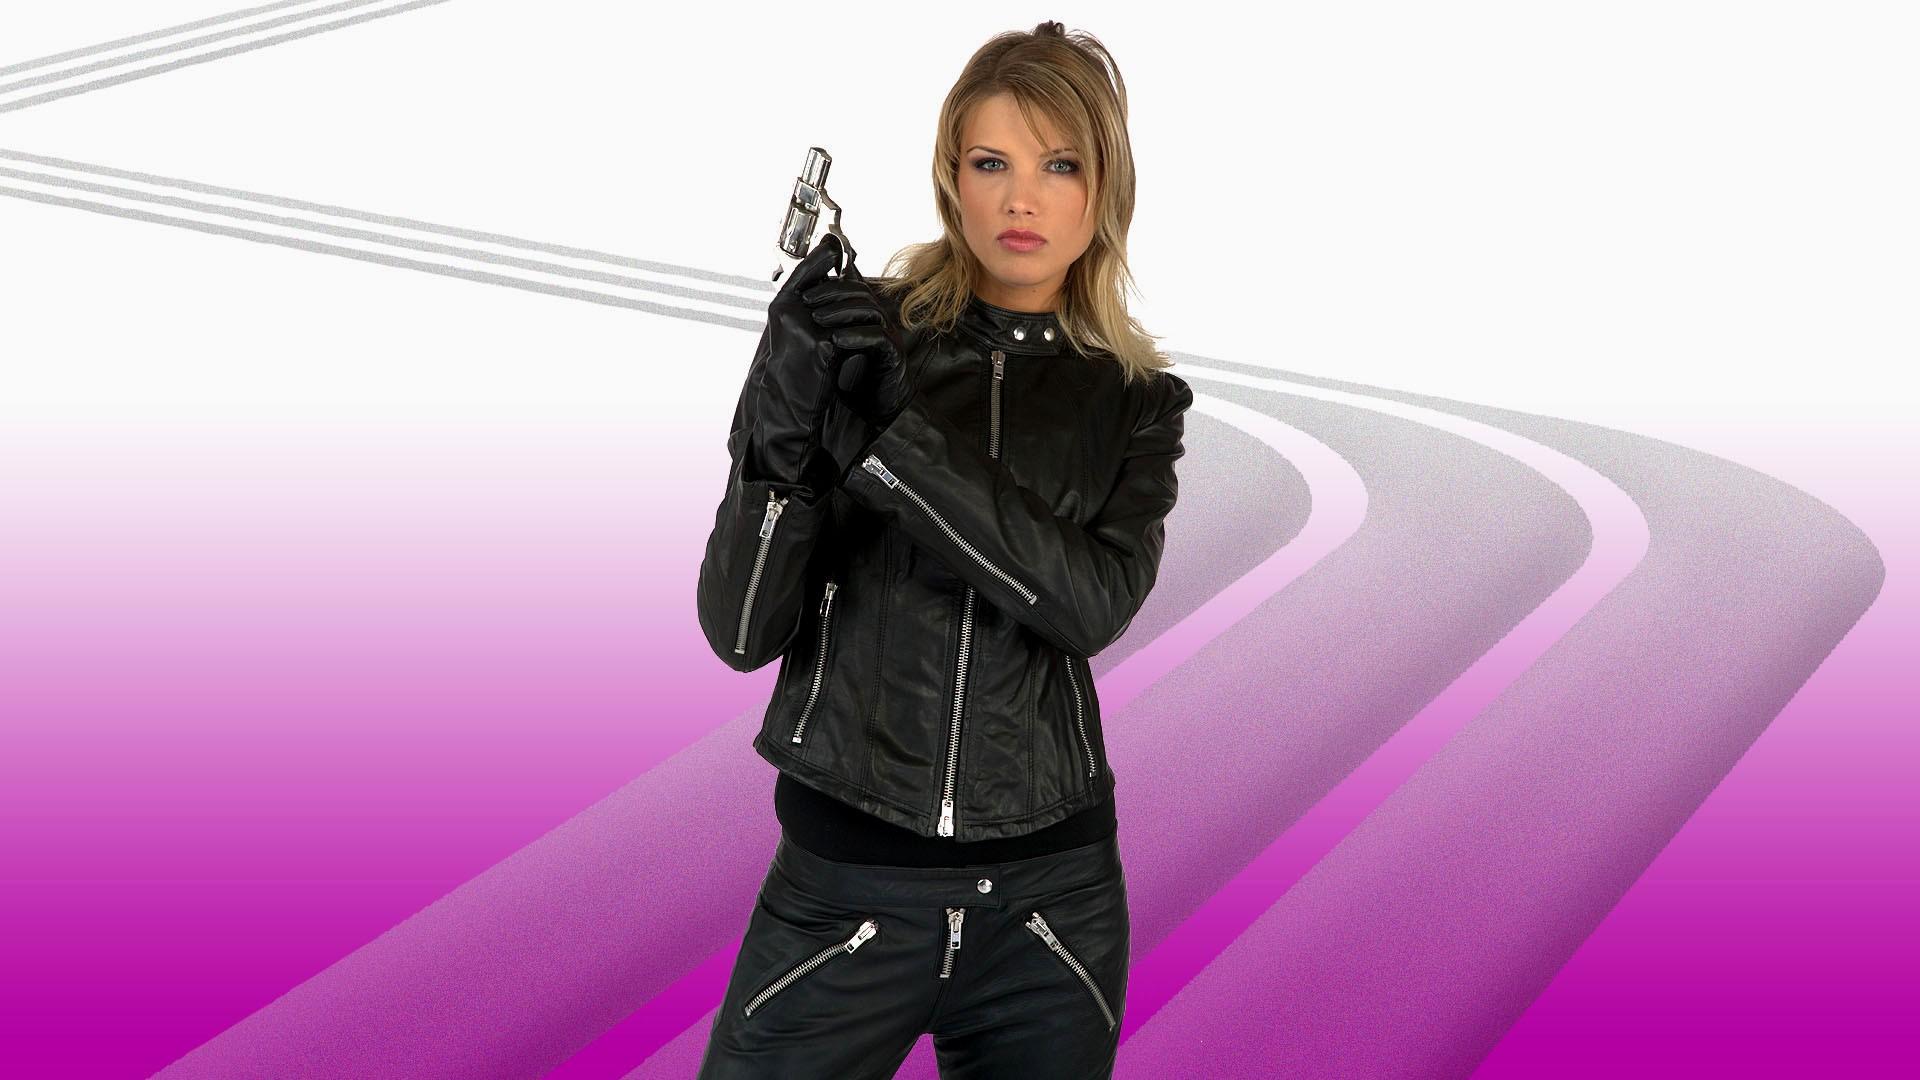 gun girl computer wallpapers - photo #17